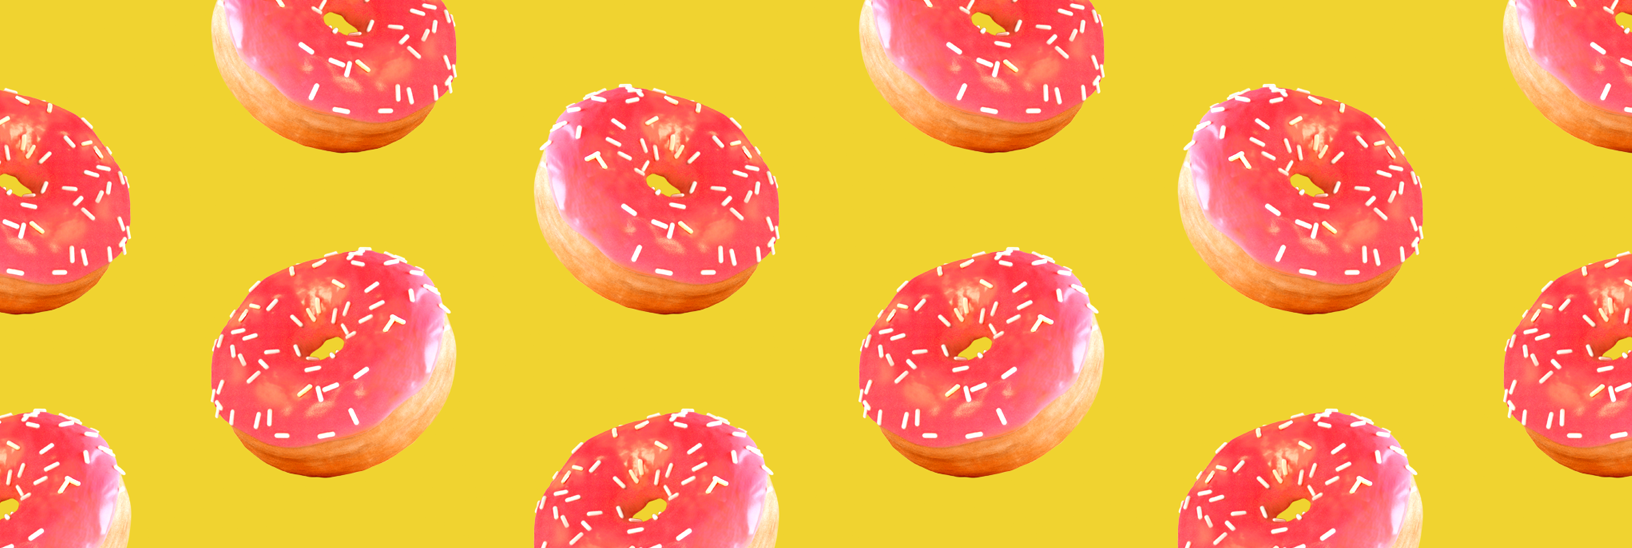 Static_Donuts_1632x548